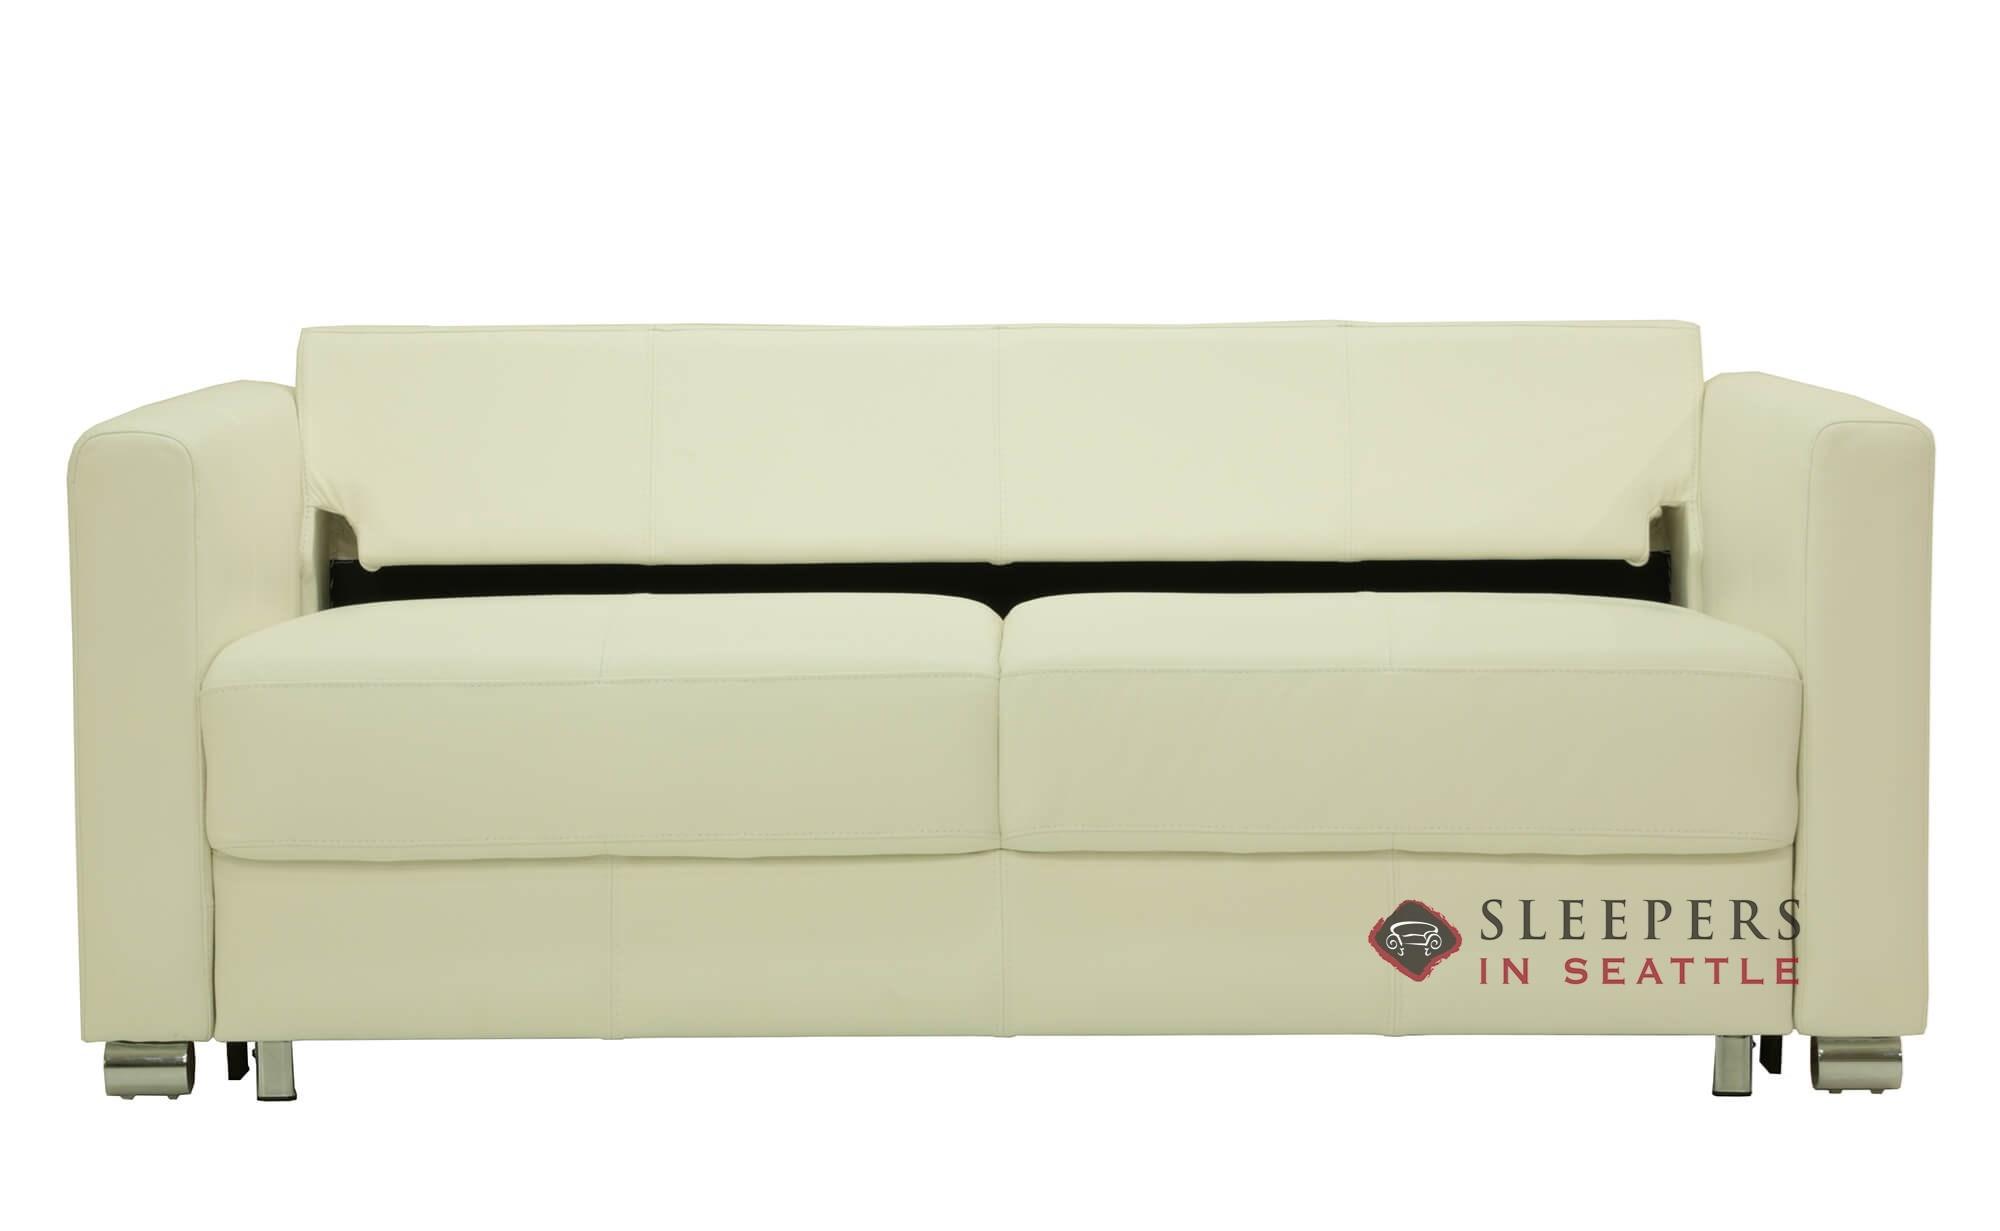 Astonishing Luonto Fantasy Ii Queen Leather Sleeper Sofa Spiritservingveterans Wood Chair Design Ideas Spiritservingveteransorg